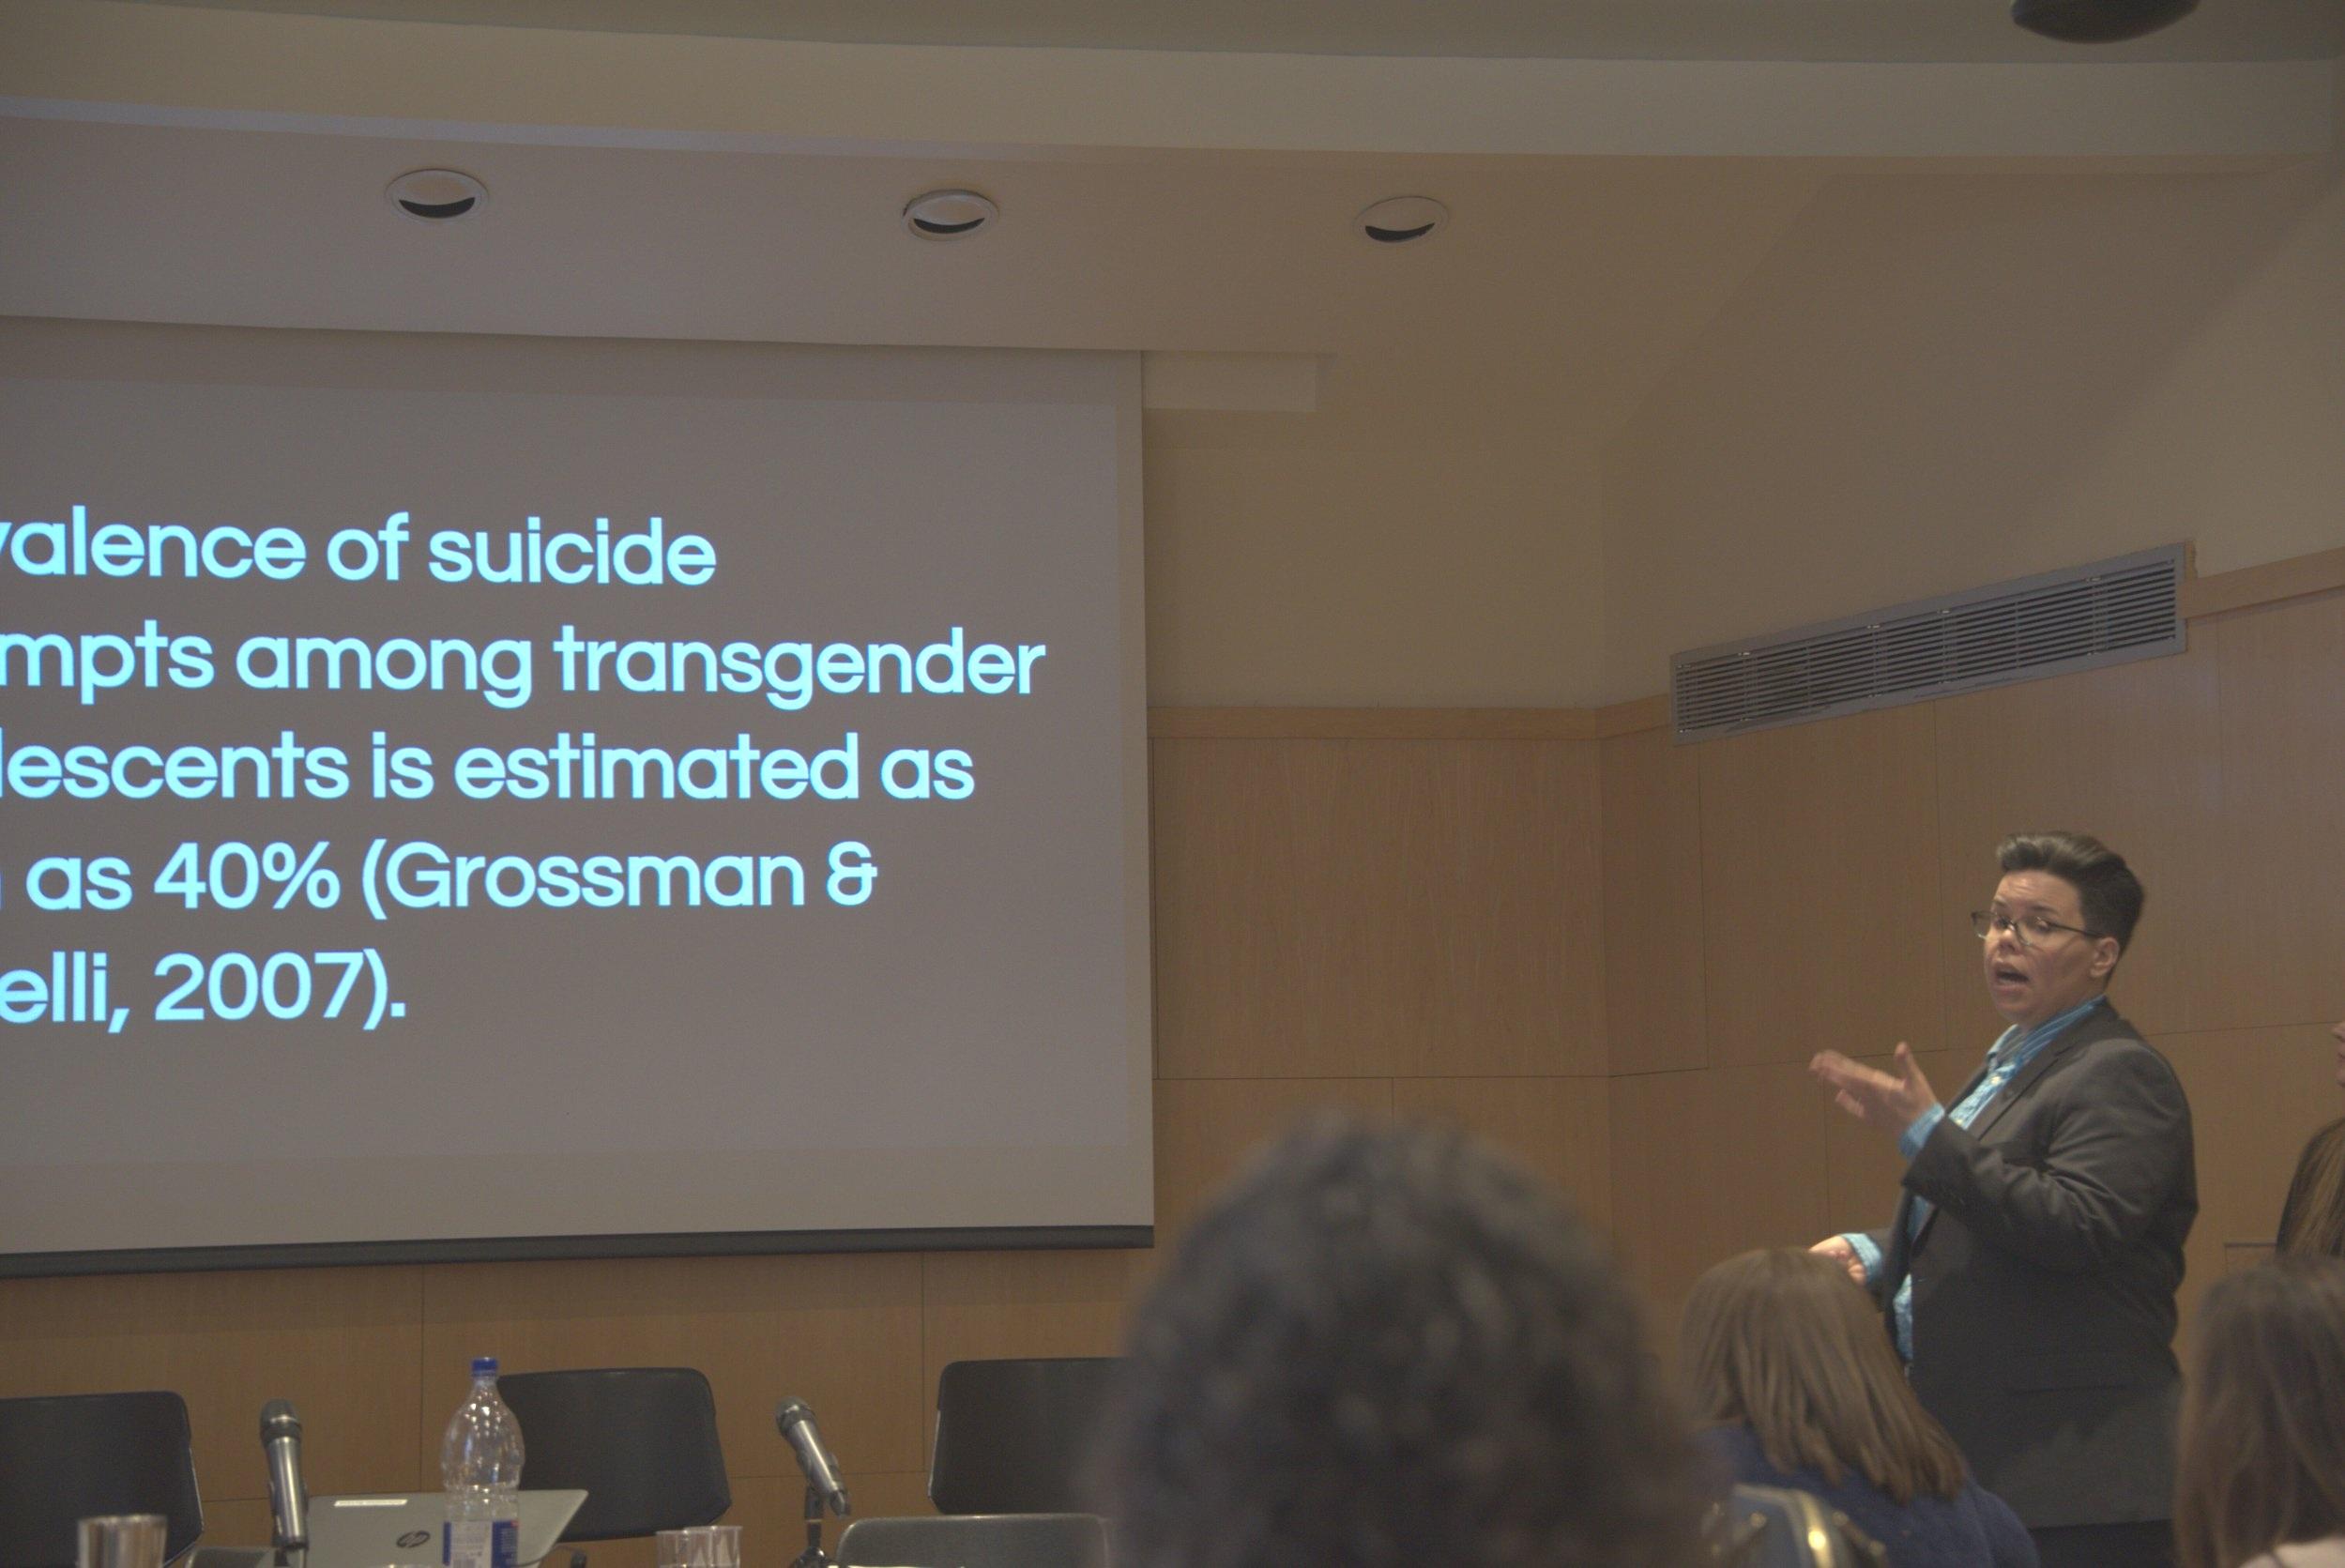 Director of Education, Dr. Jan Kaminsky delivering our course RHC 3: Caring for the Transgender and Gender Fluid Patient.